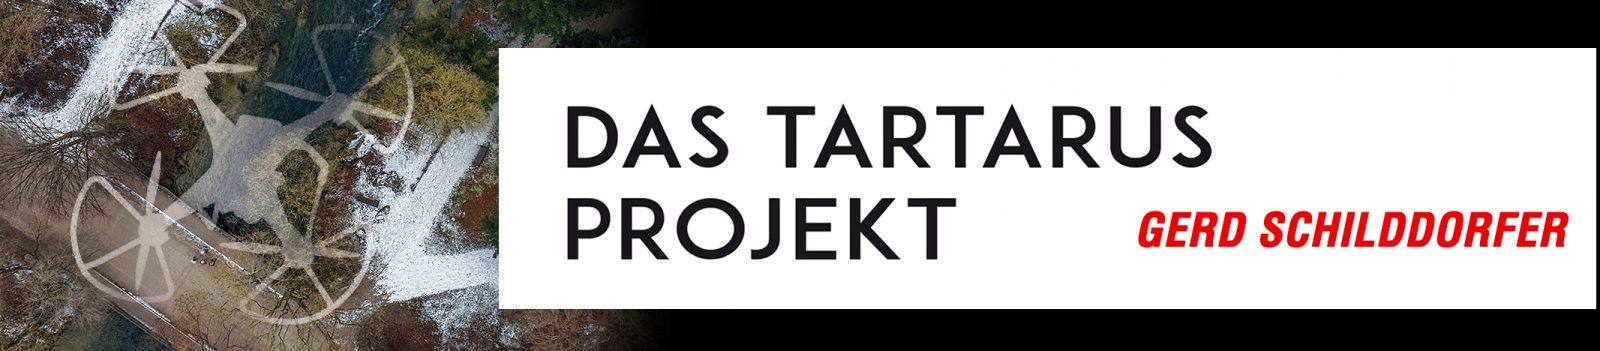 DasTartarusProjekt